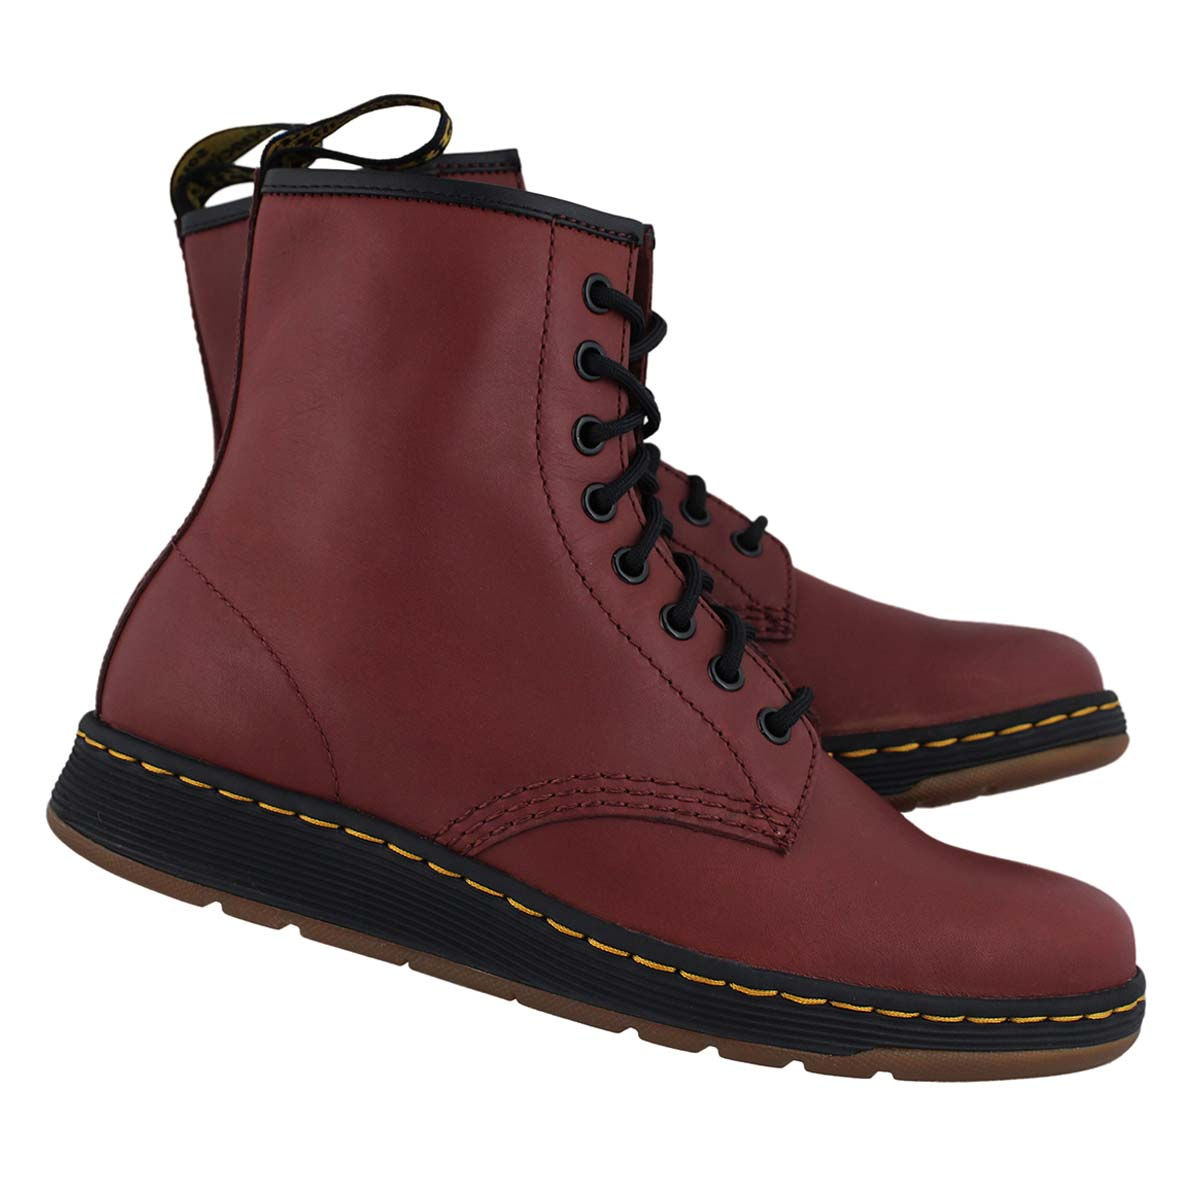 Lds Lite Newton cherry 8 eye combat boot